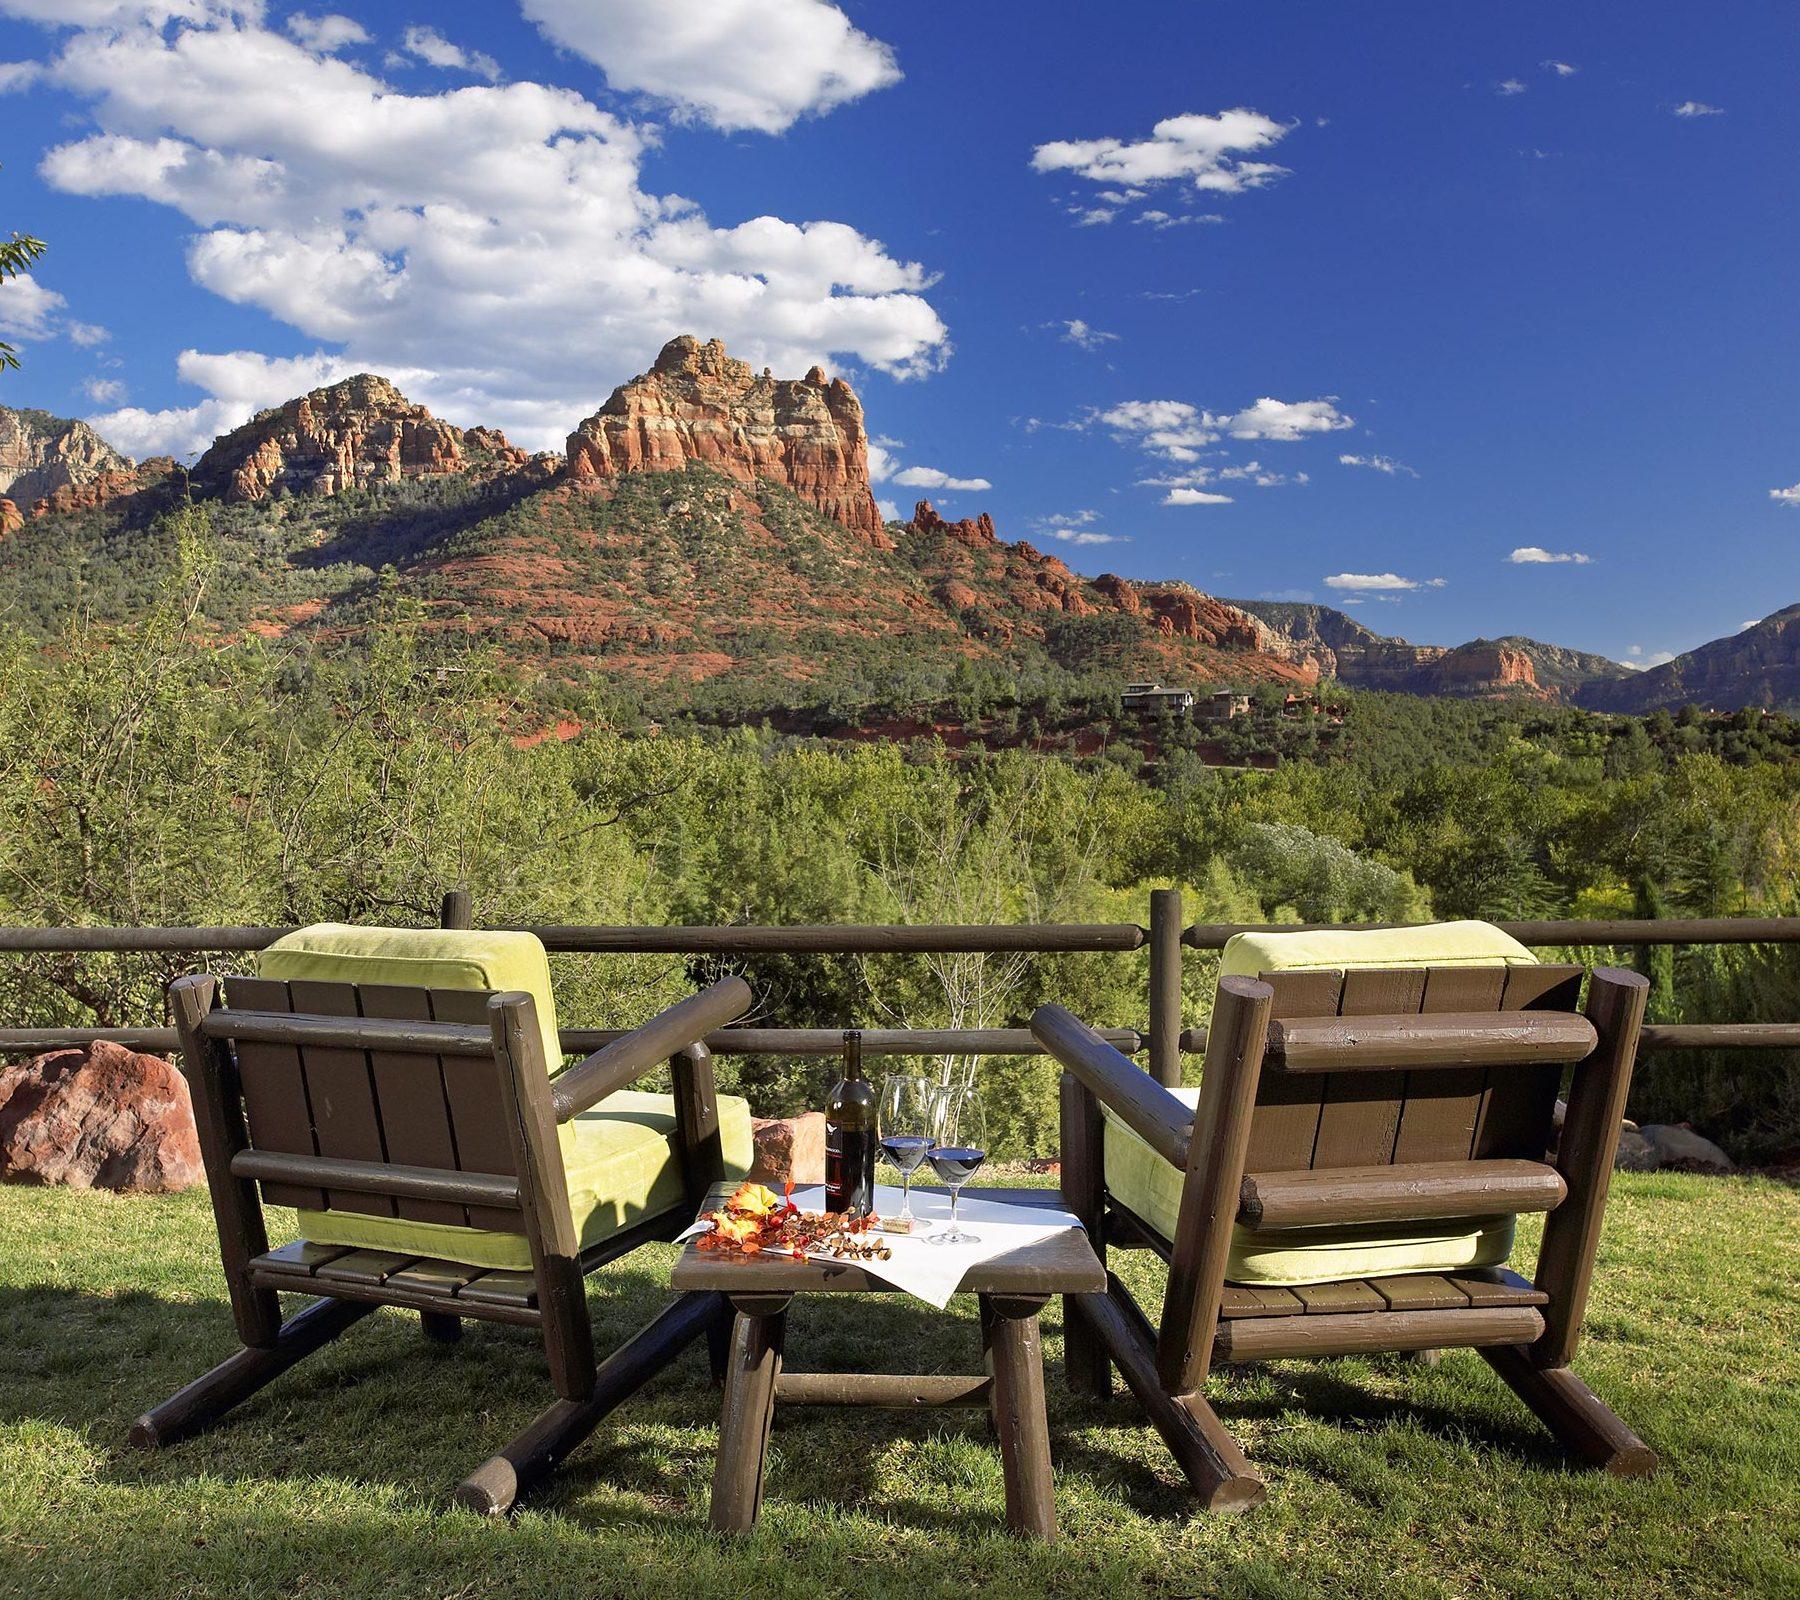 Visit Sedona Arizona For Wellness Retreats And Vivid